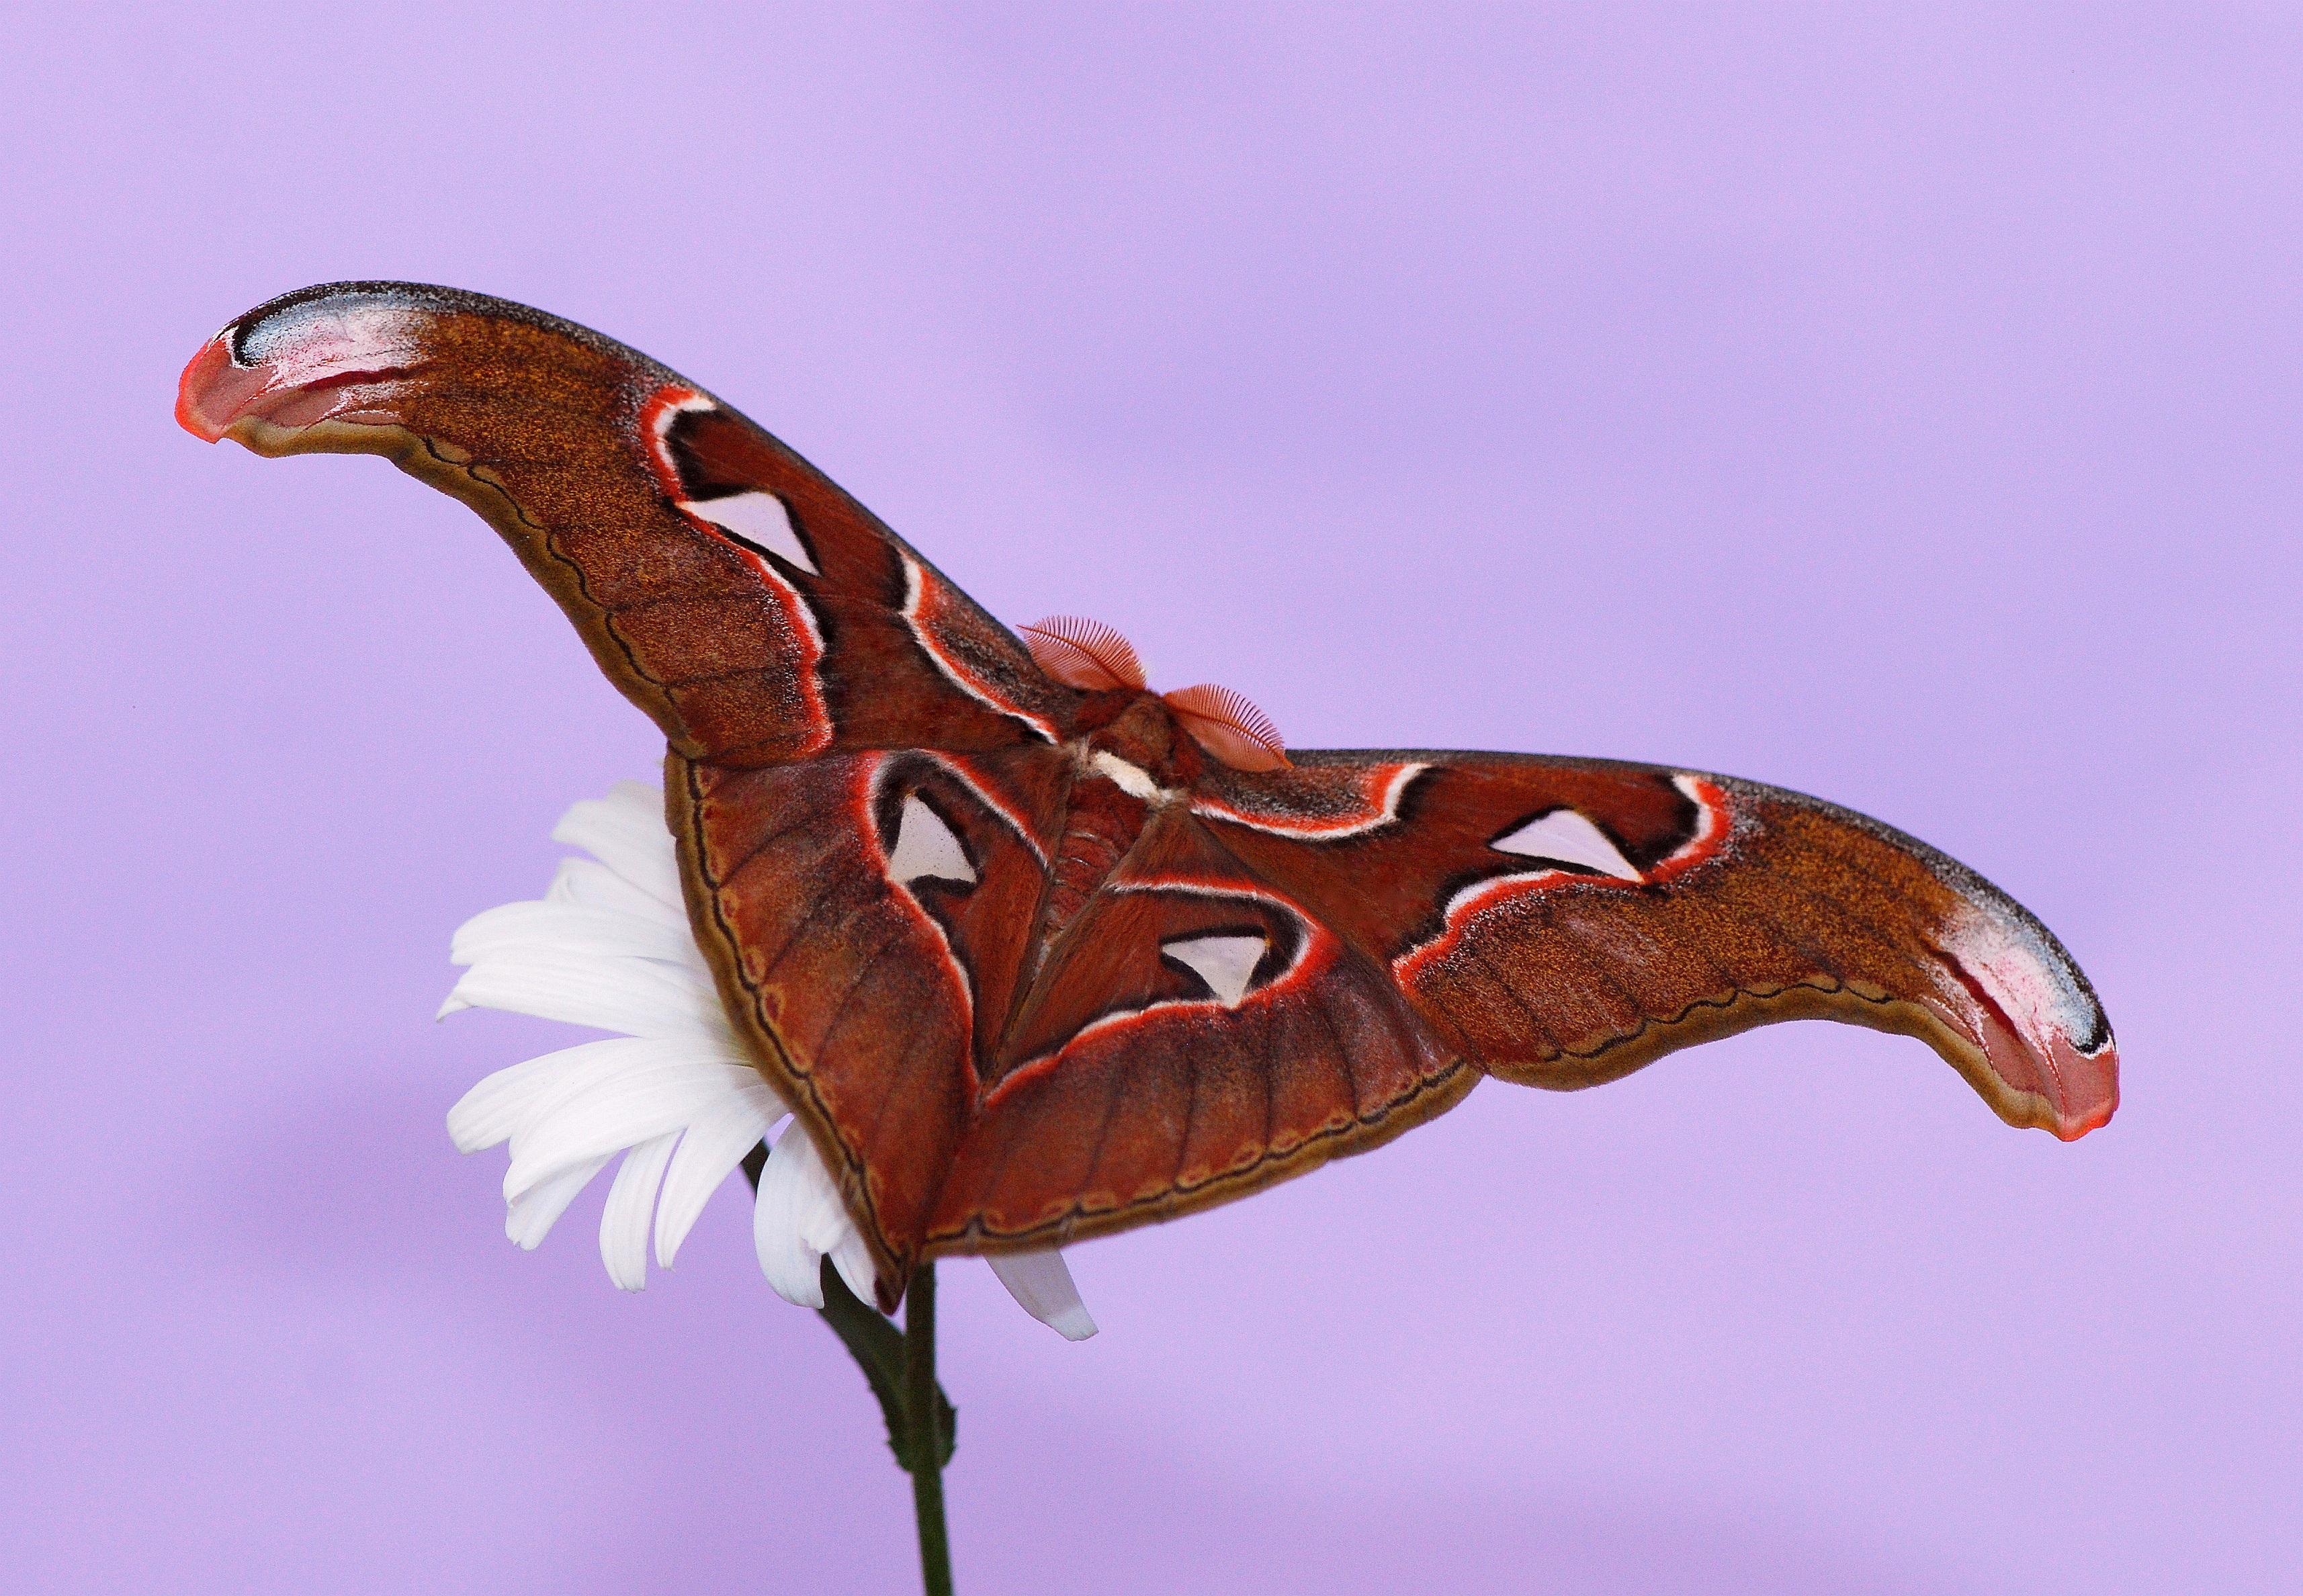 free images insect fauna invertebrate large exotic macro